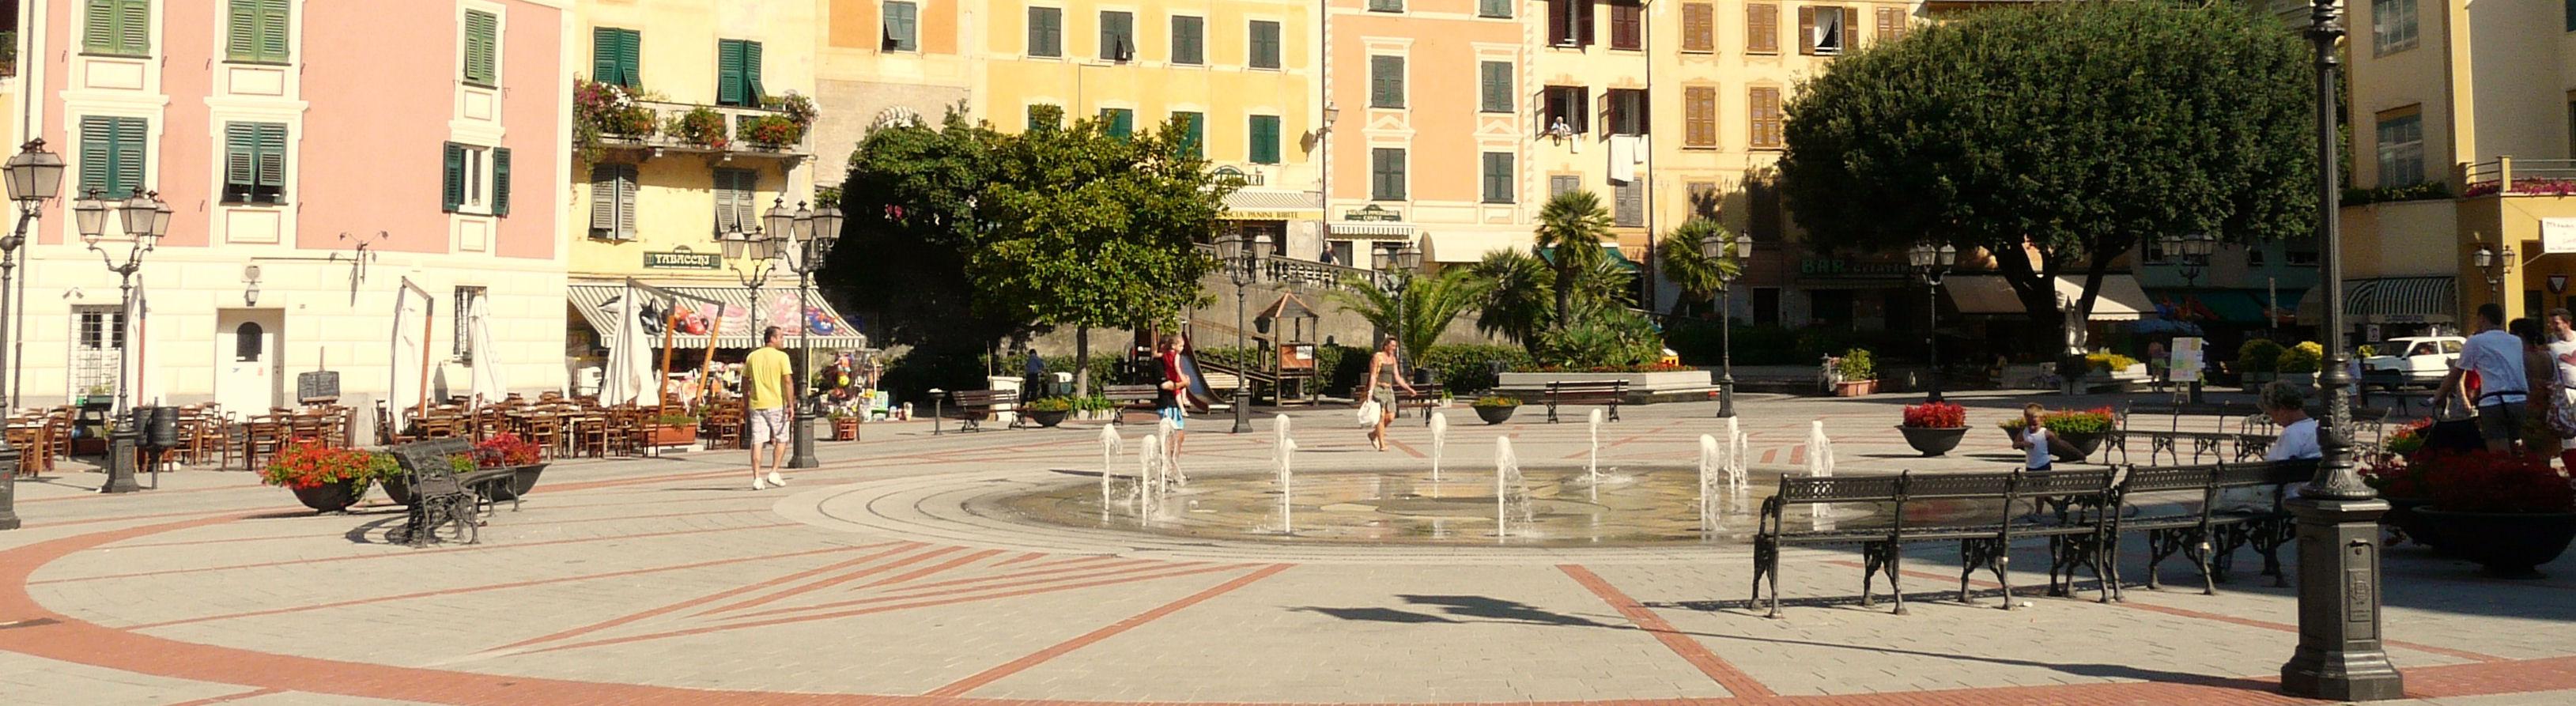 Zoagli-piazza